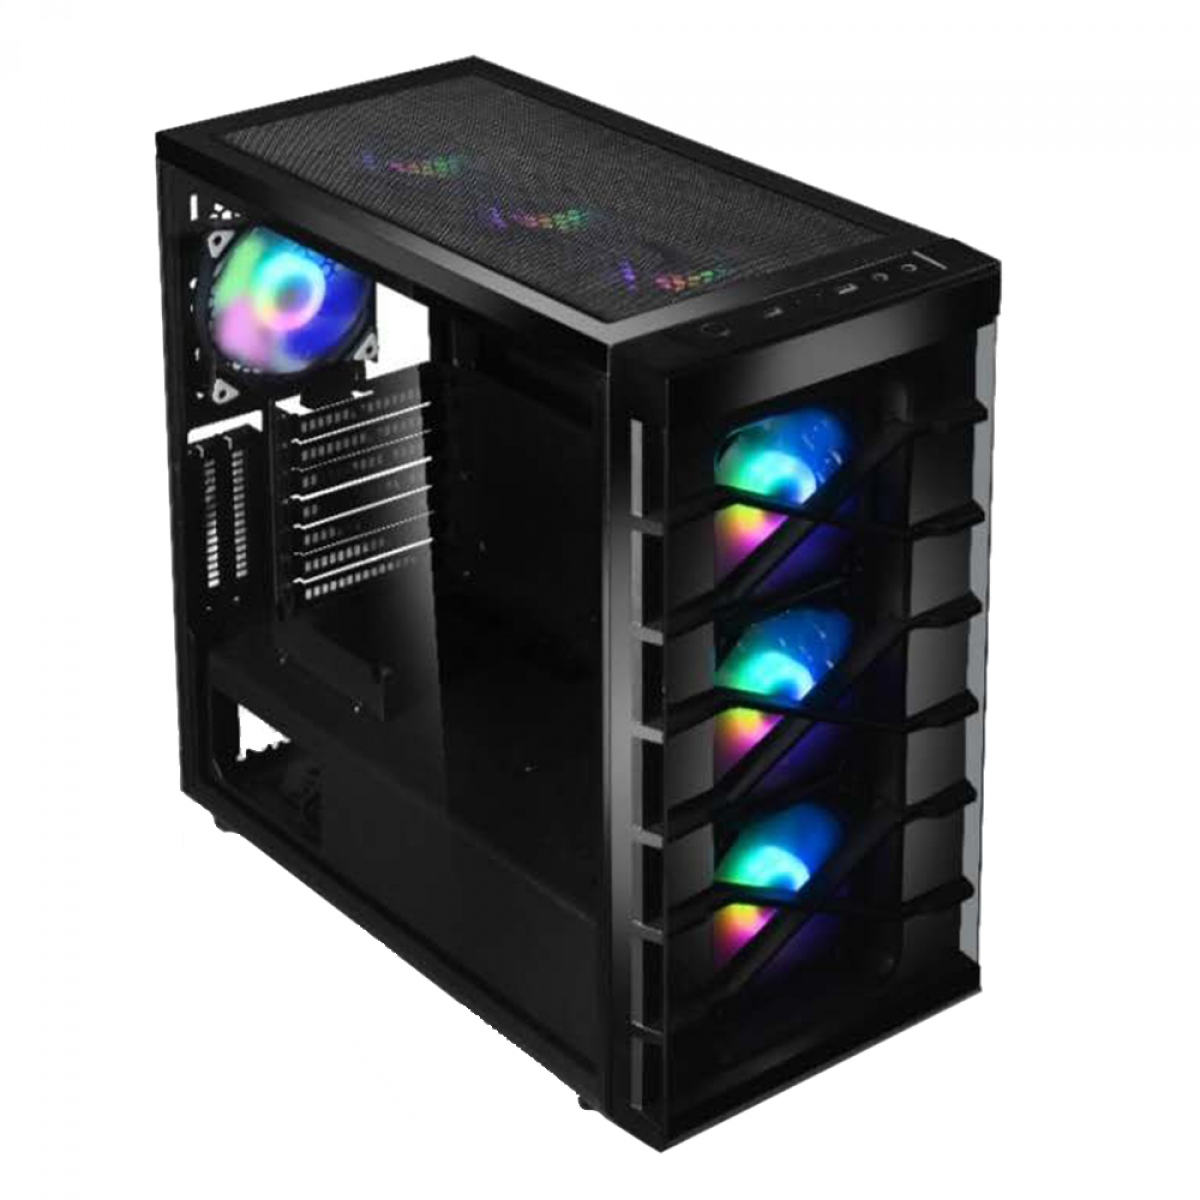 Gabinete Gamer Liketec Zeus, Mid Tower, RGB, Vidro Temperado, Black, ATX, Sem Fonte, Com 4 Fans